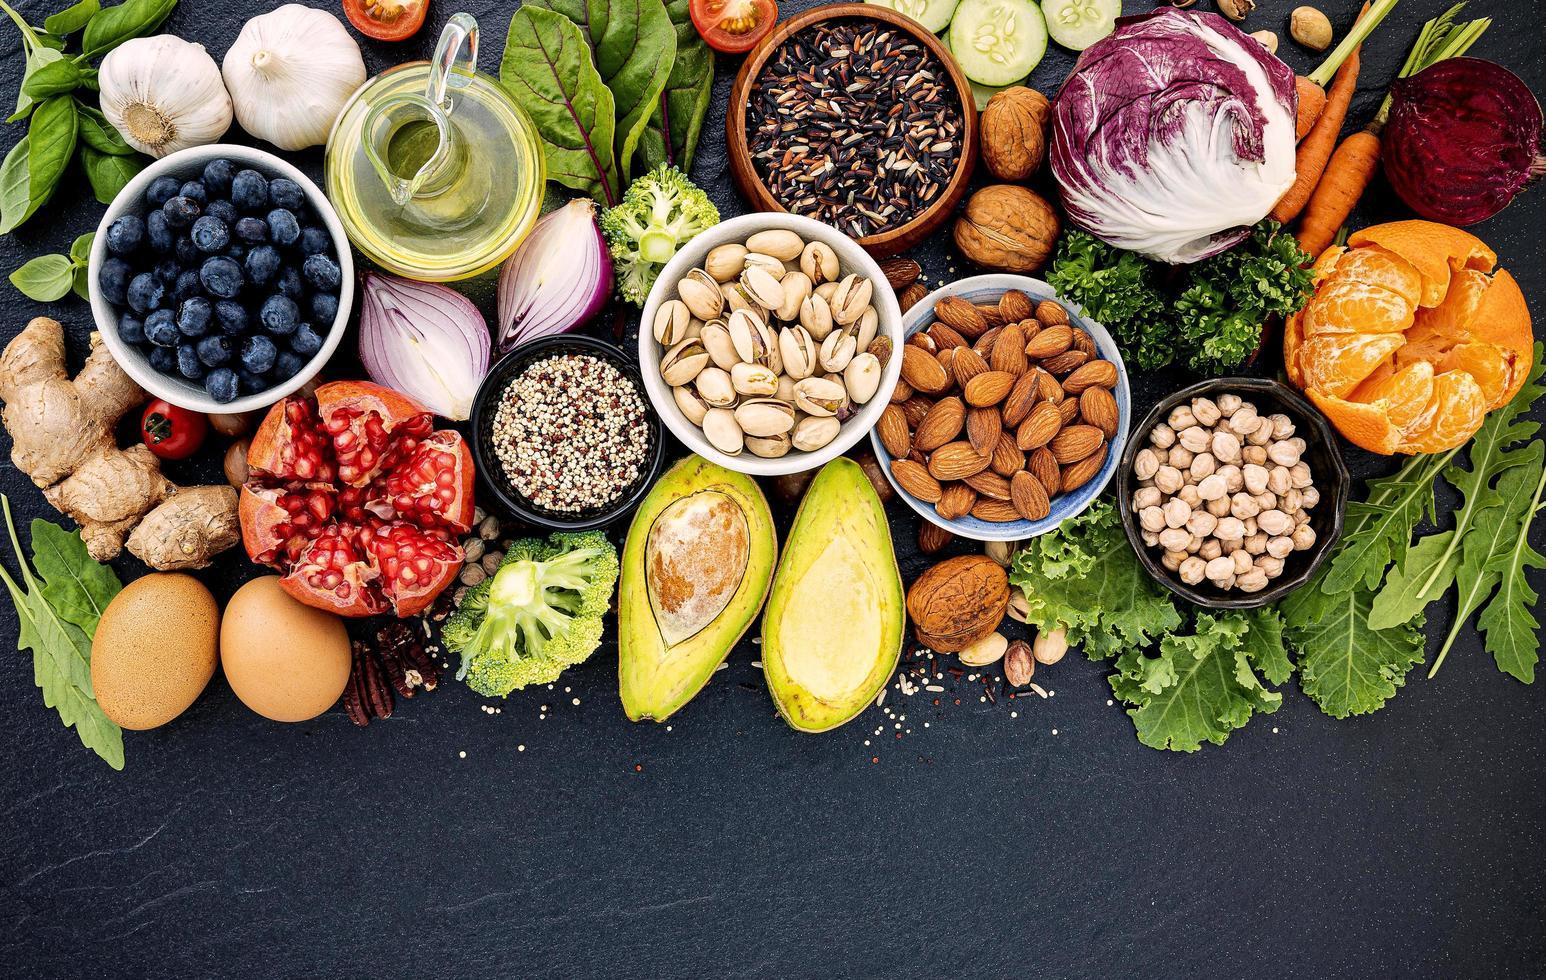 Healthy food on a dark background photo